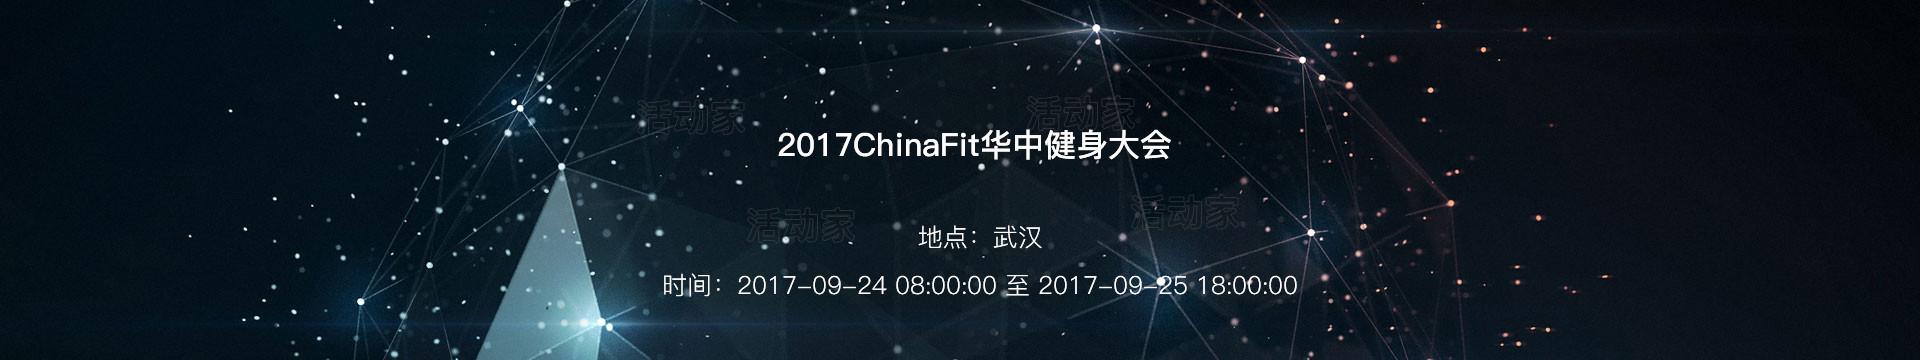 2017ChinaFit华中健身大会